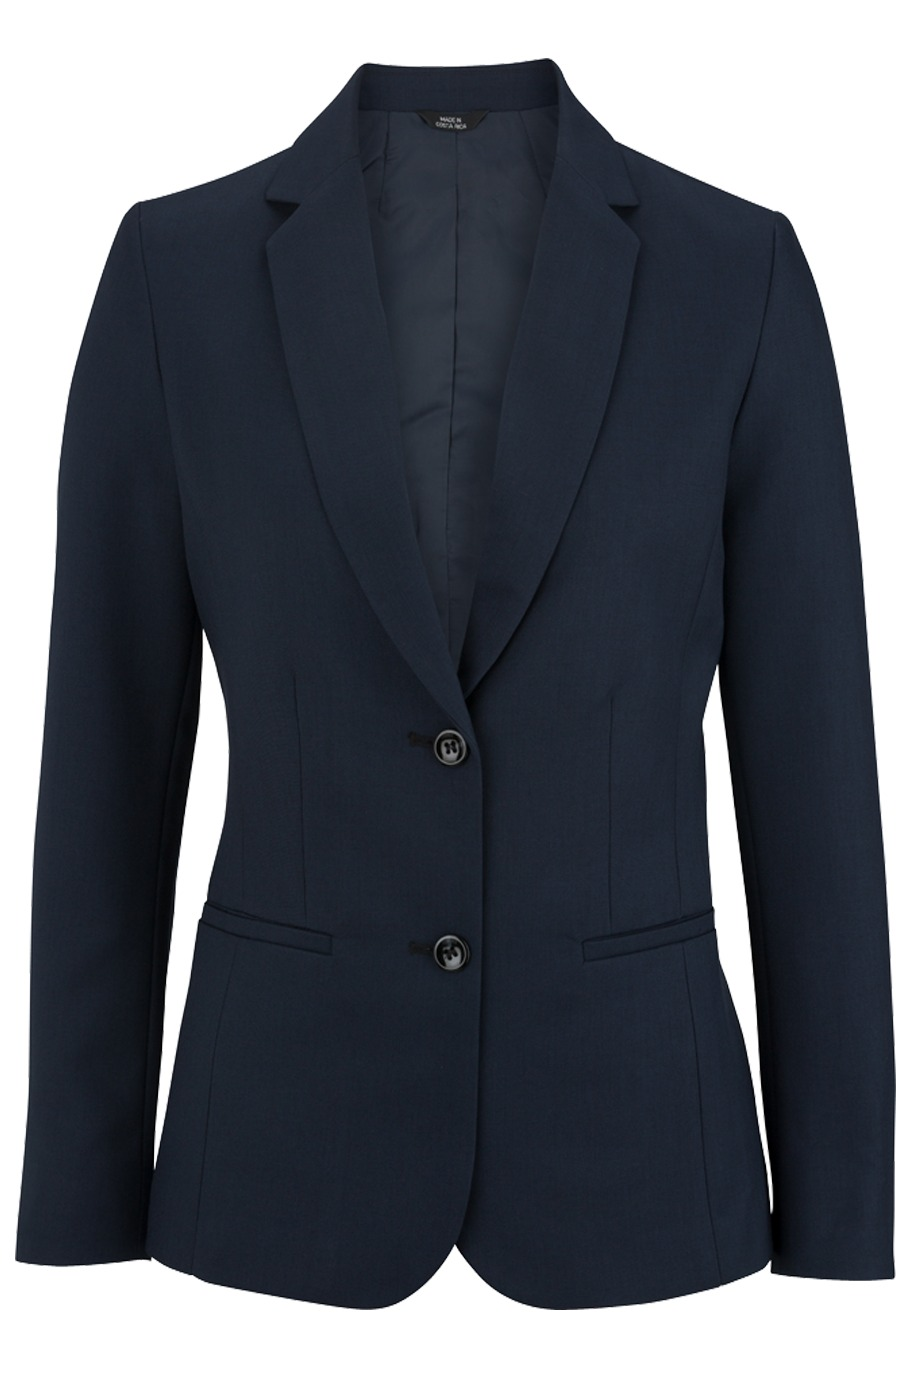 Ladies' Synergy Washable Suit Coat Longer Length.jpg